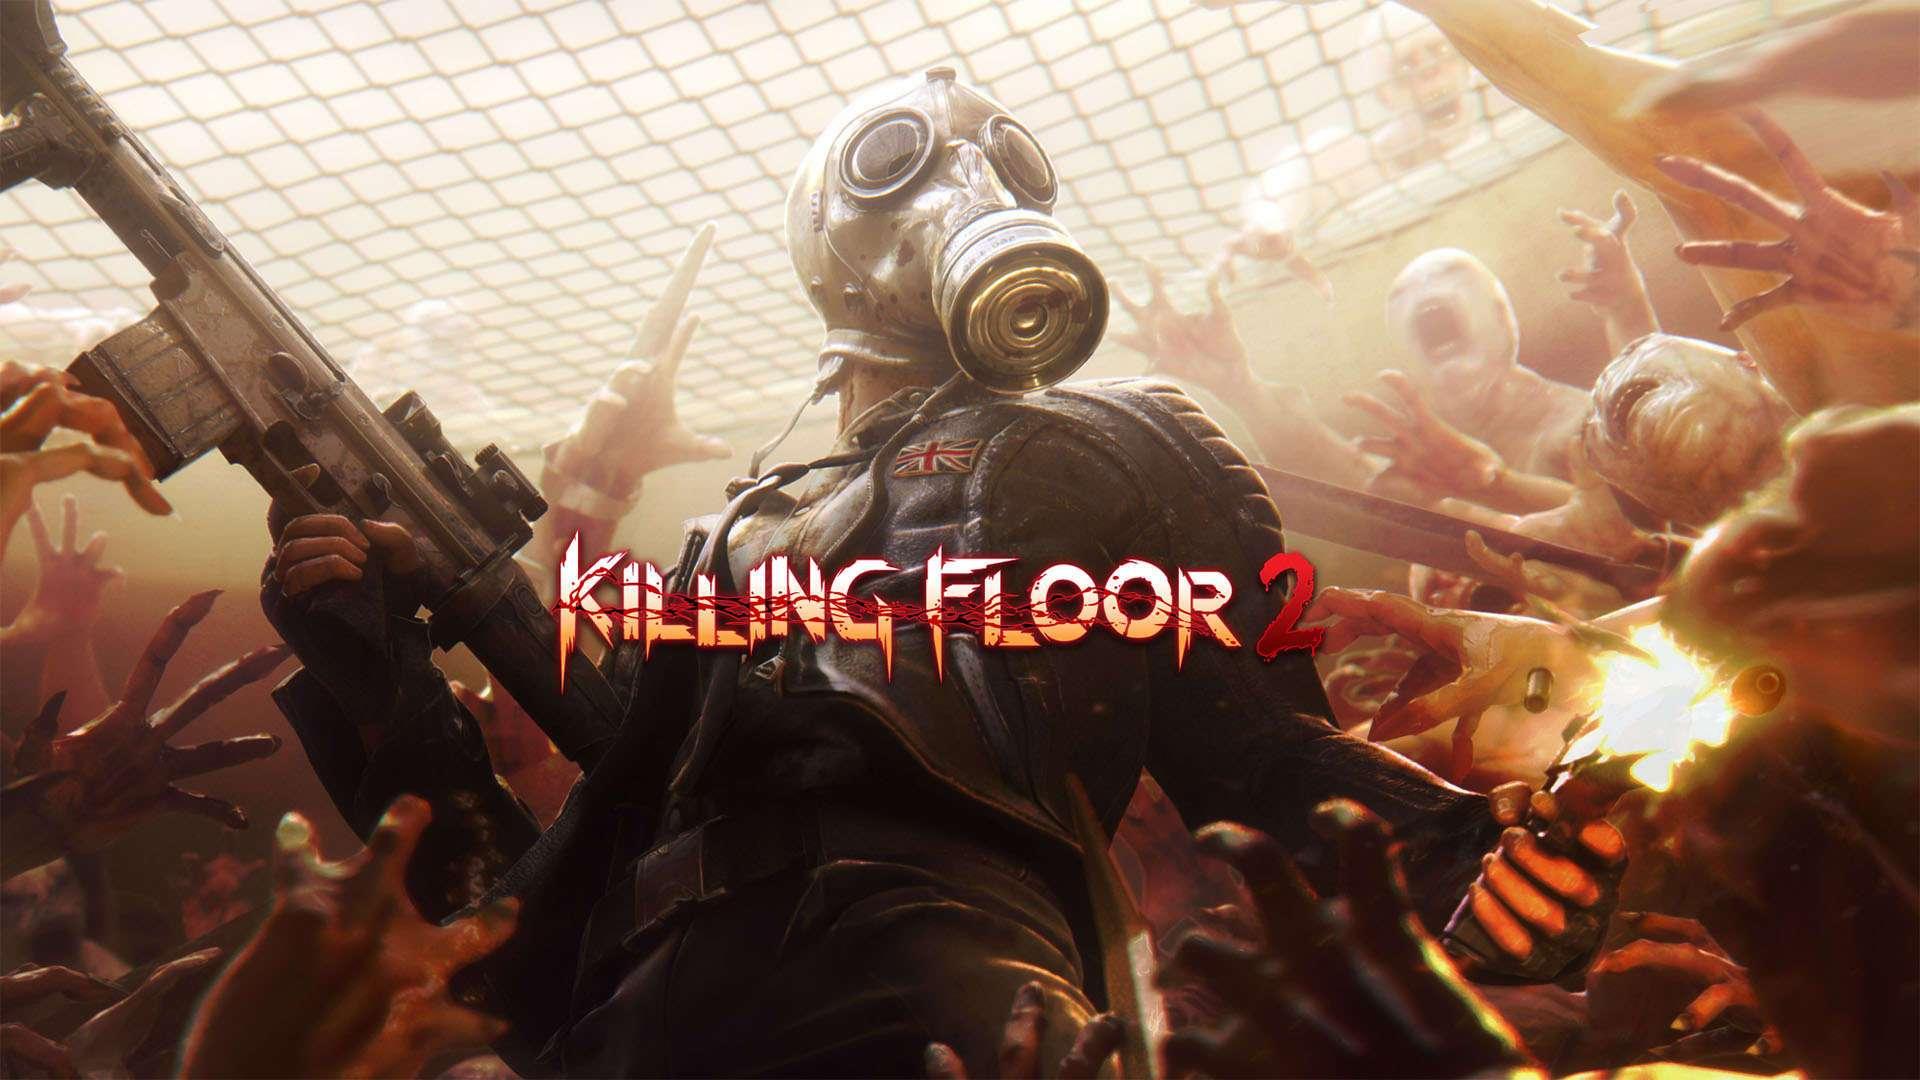 Killing Floor 2 Torrent Instructions